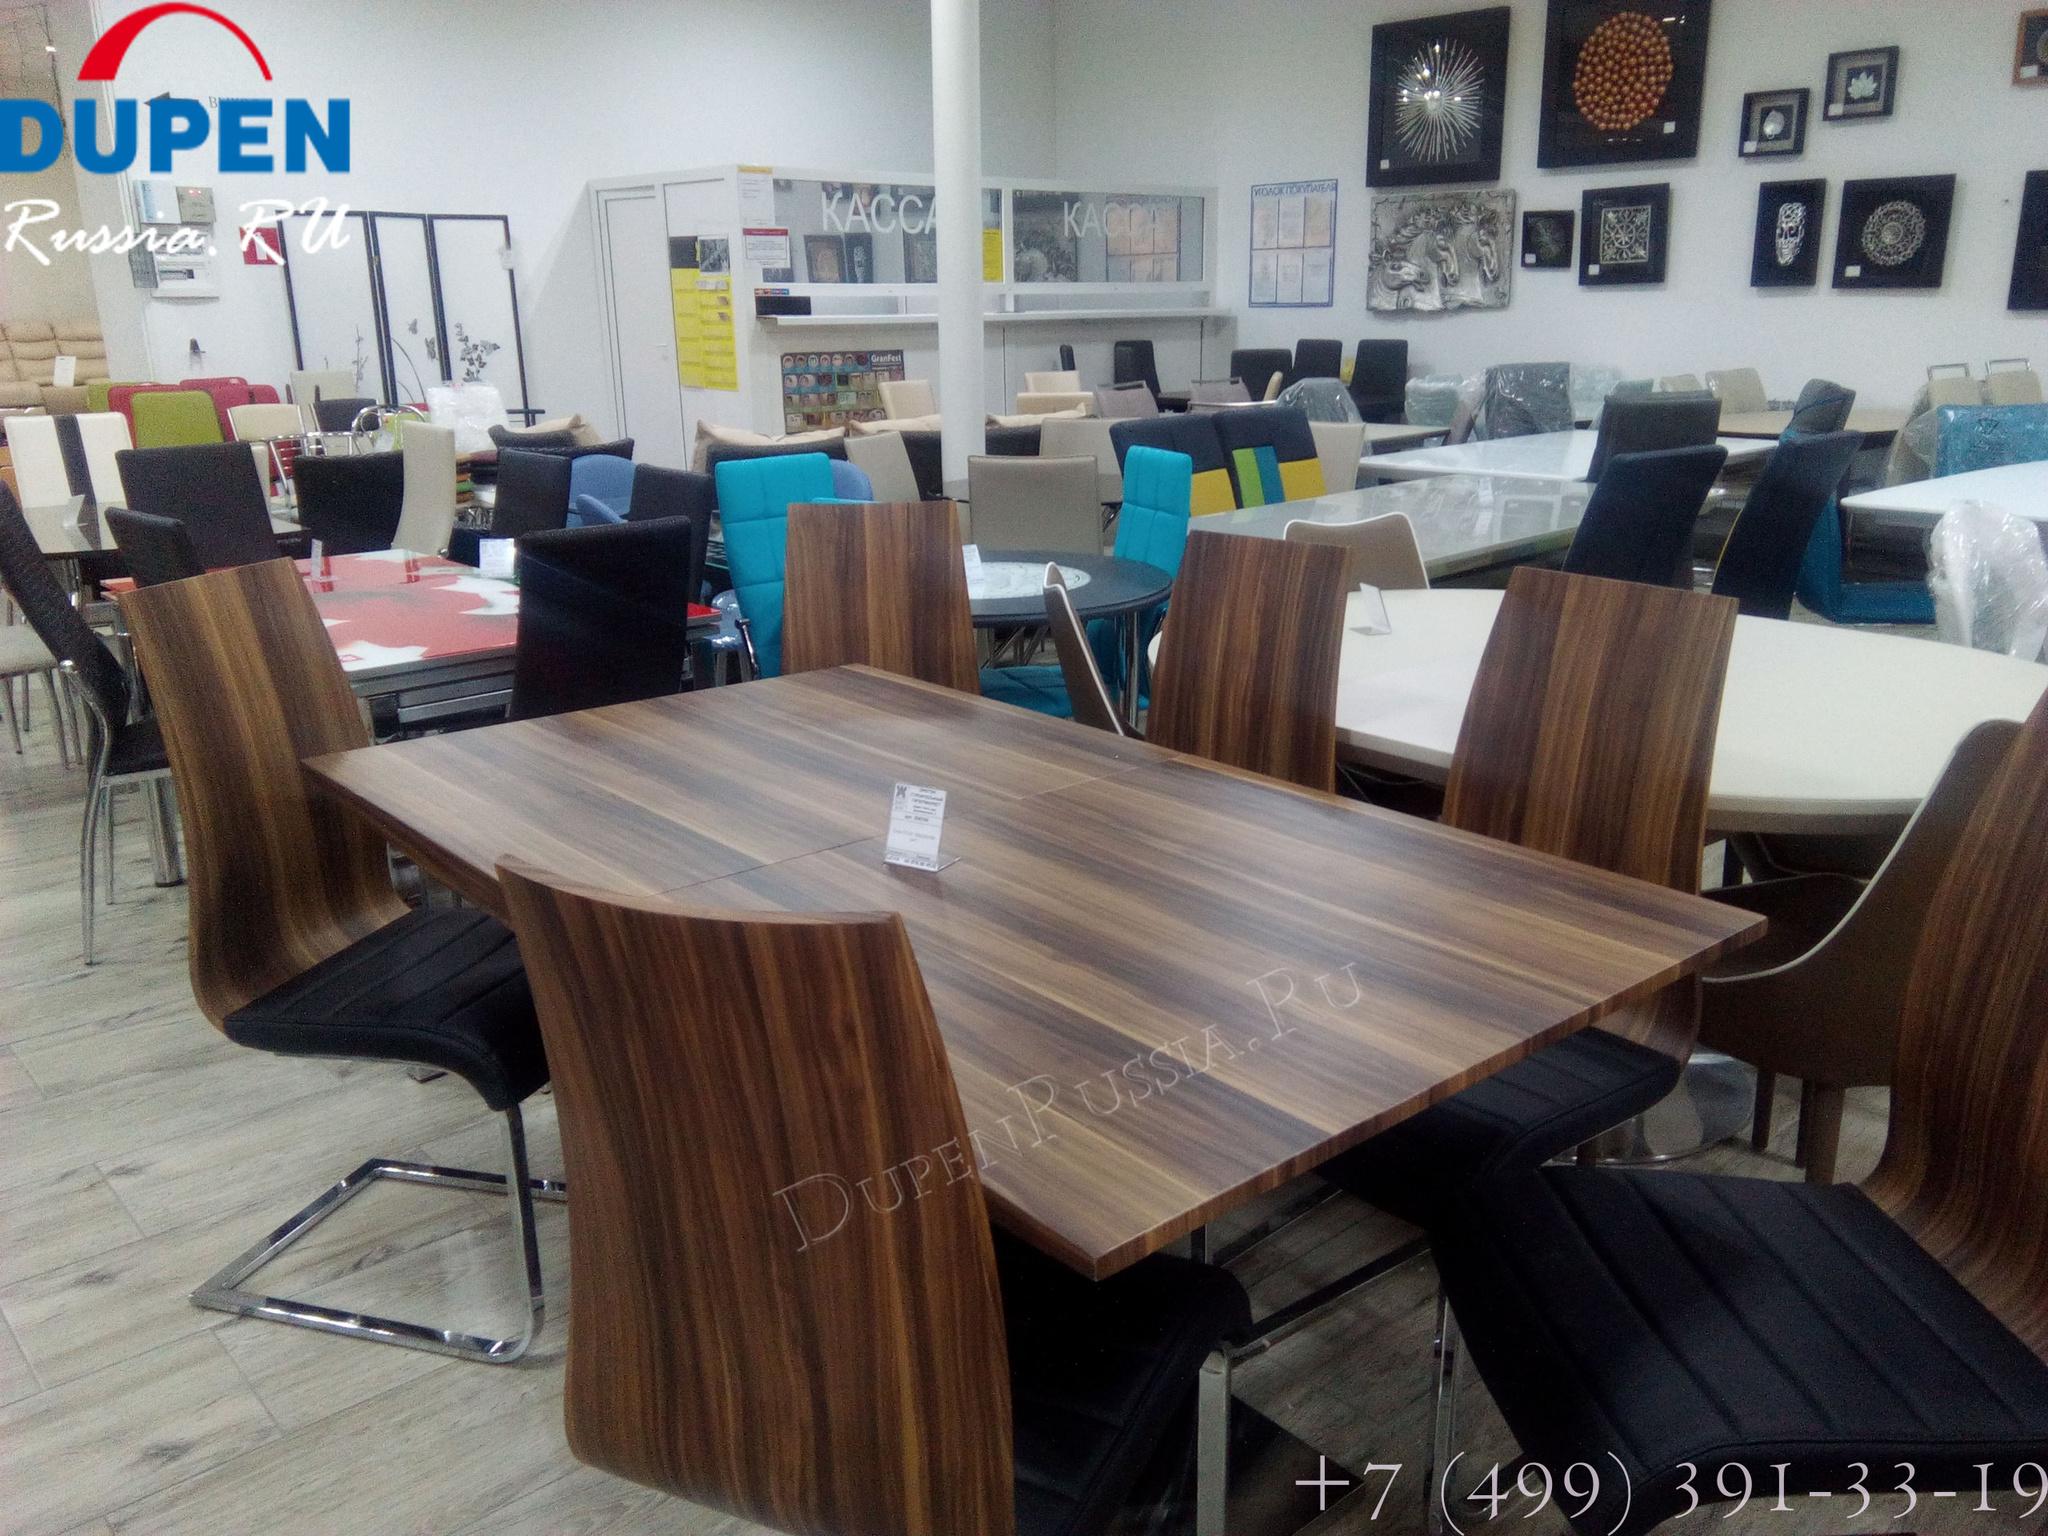 Стол DUPEN DT-02 и стулья DUPEN СН-1004